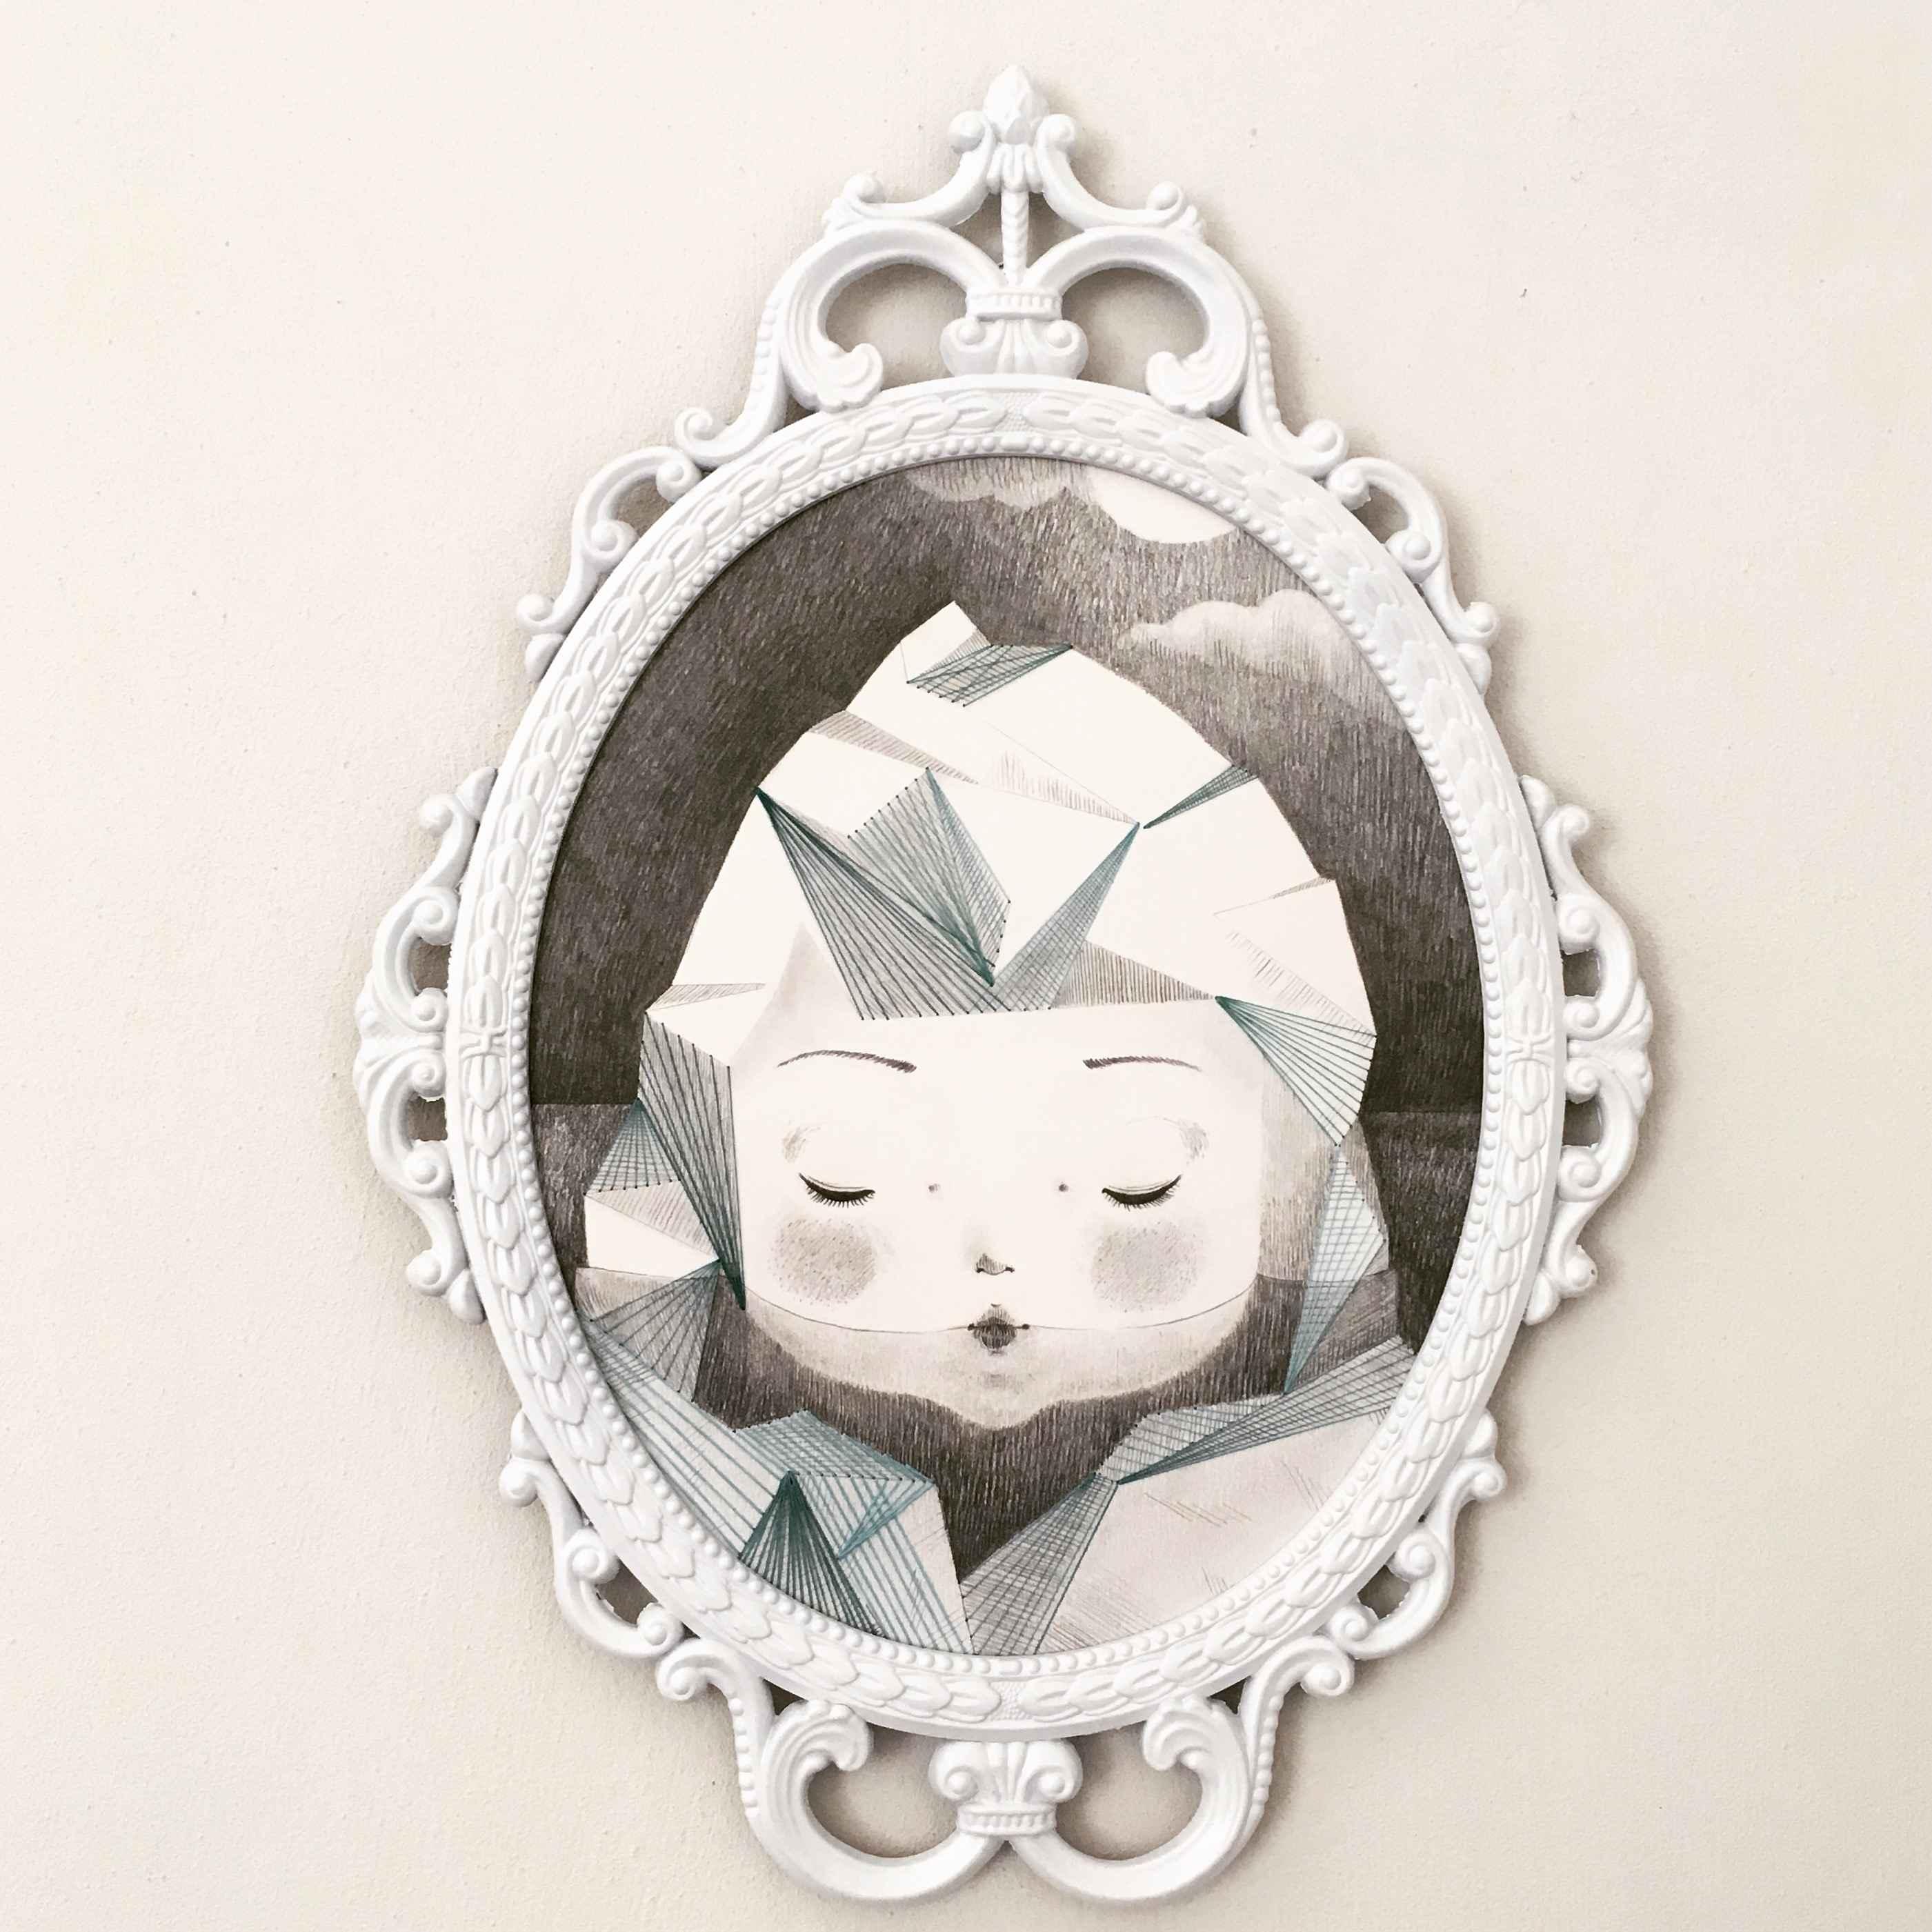 seforapons-graphite-embroidering-symbiosis-iceberg-girl-icegirl